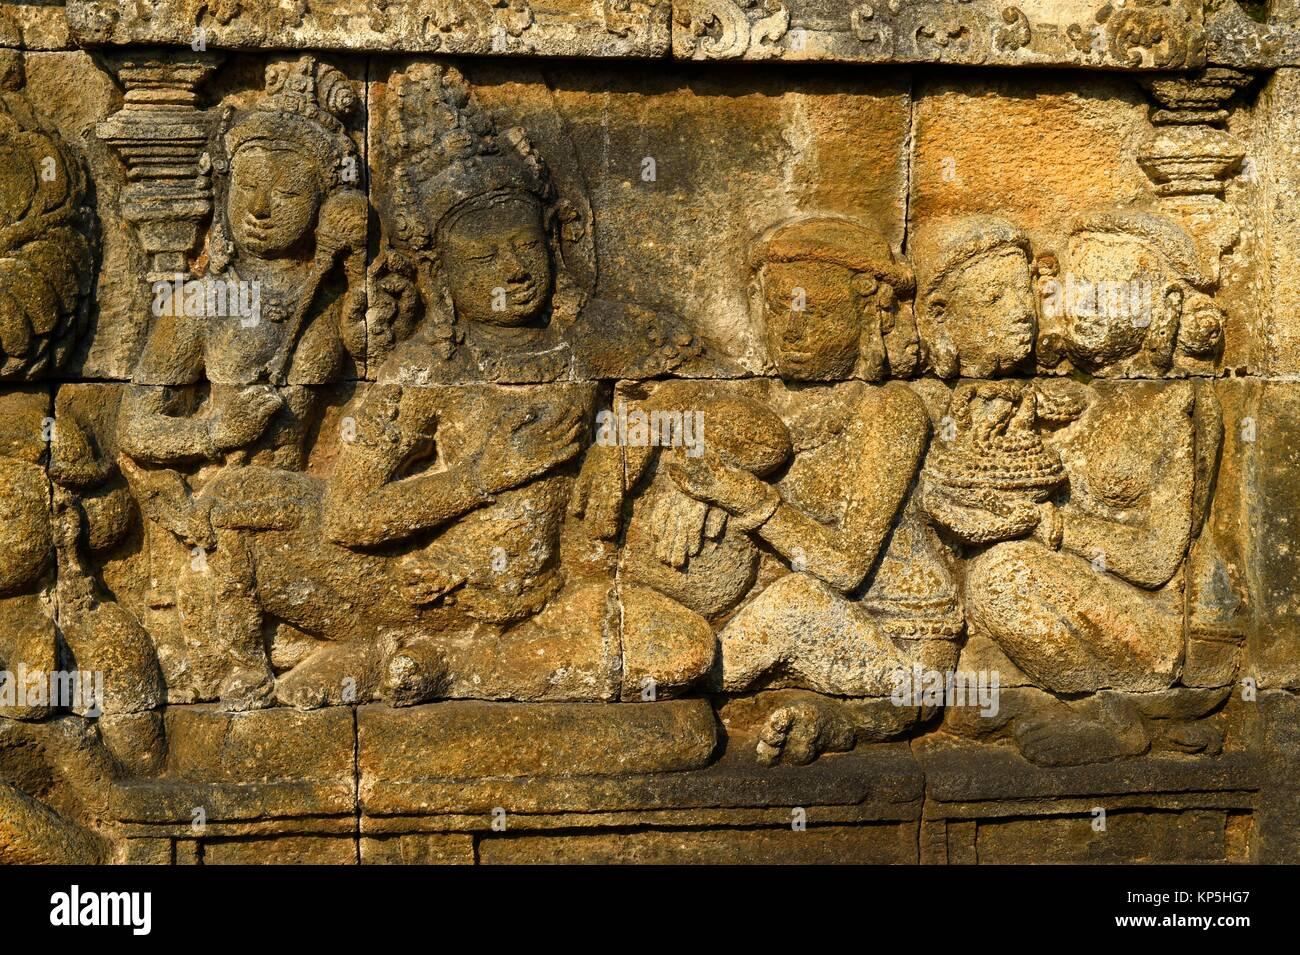 Stone relief statue sculpture stock photos